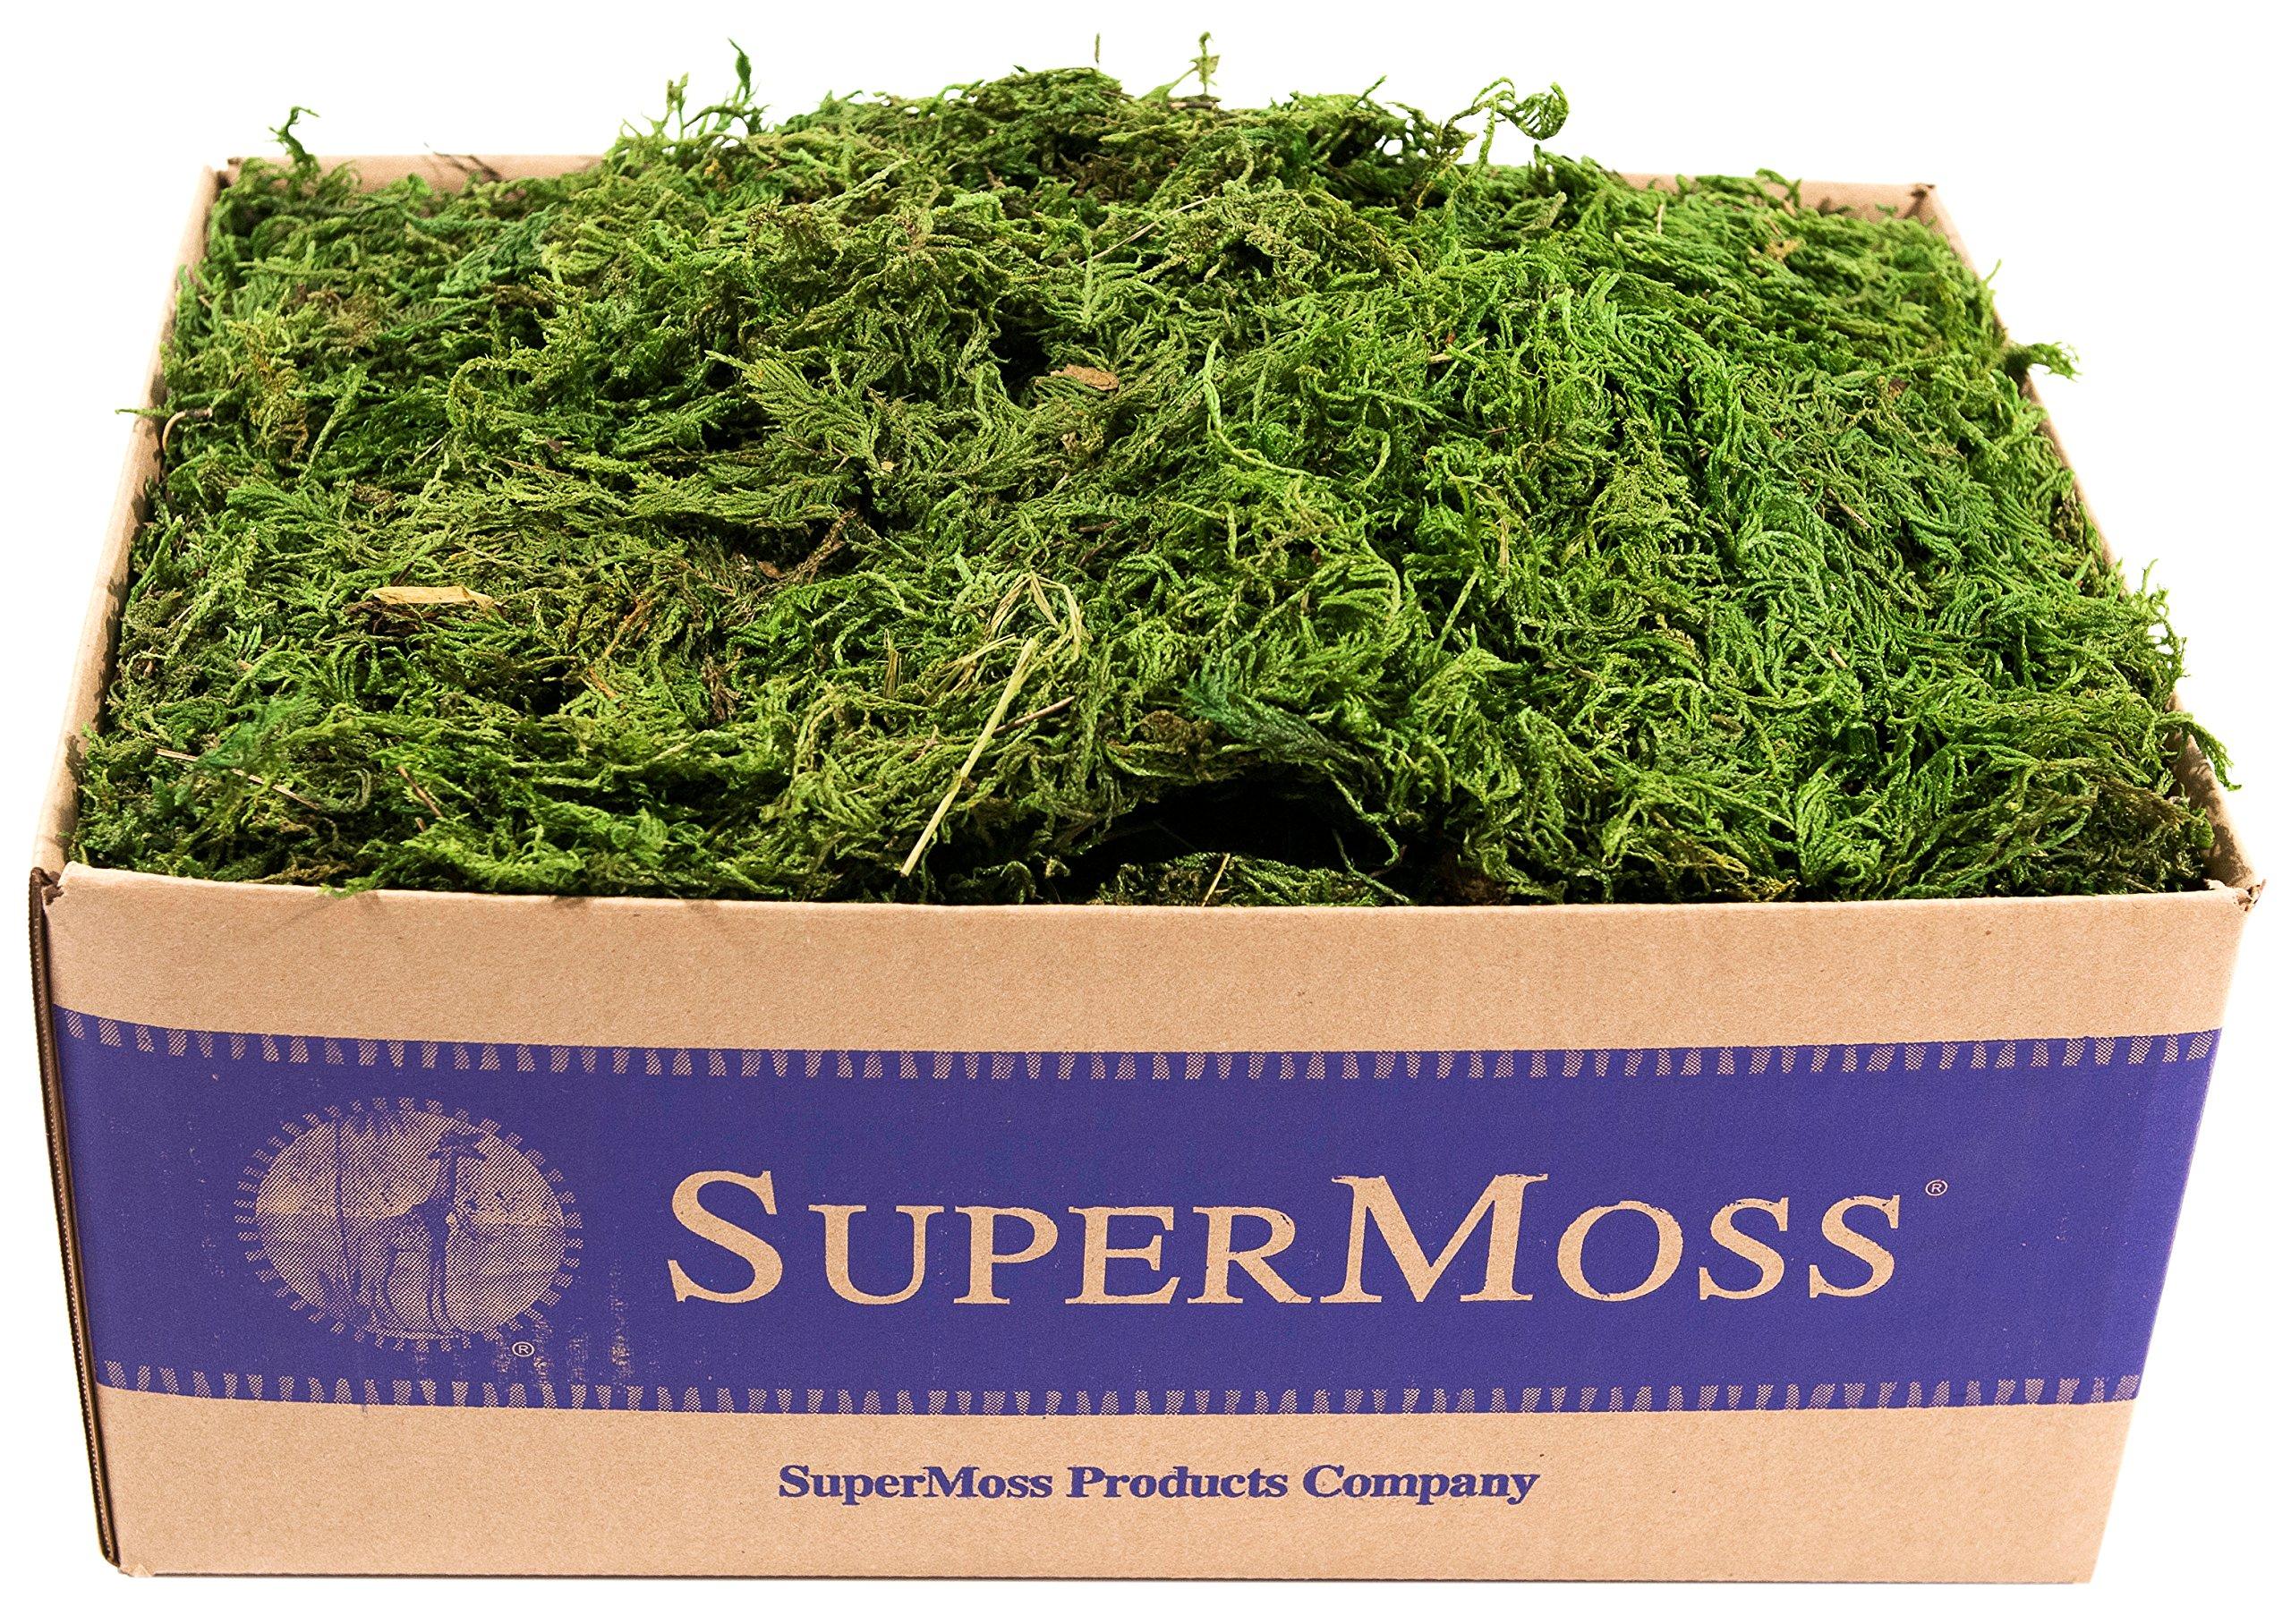 SuperMoss (25325) Forest Moss Preserved, Fresh Green, 3lbs by Super Moss